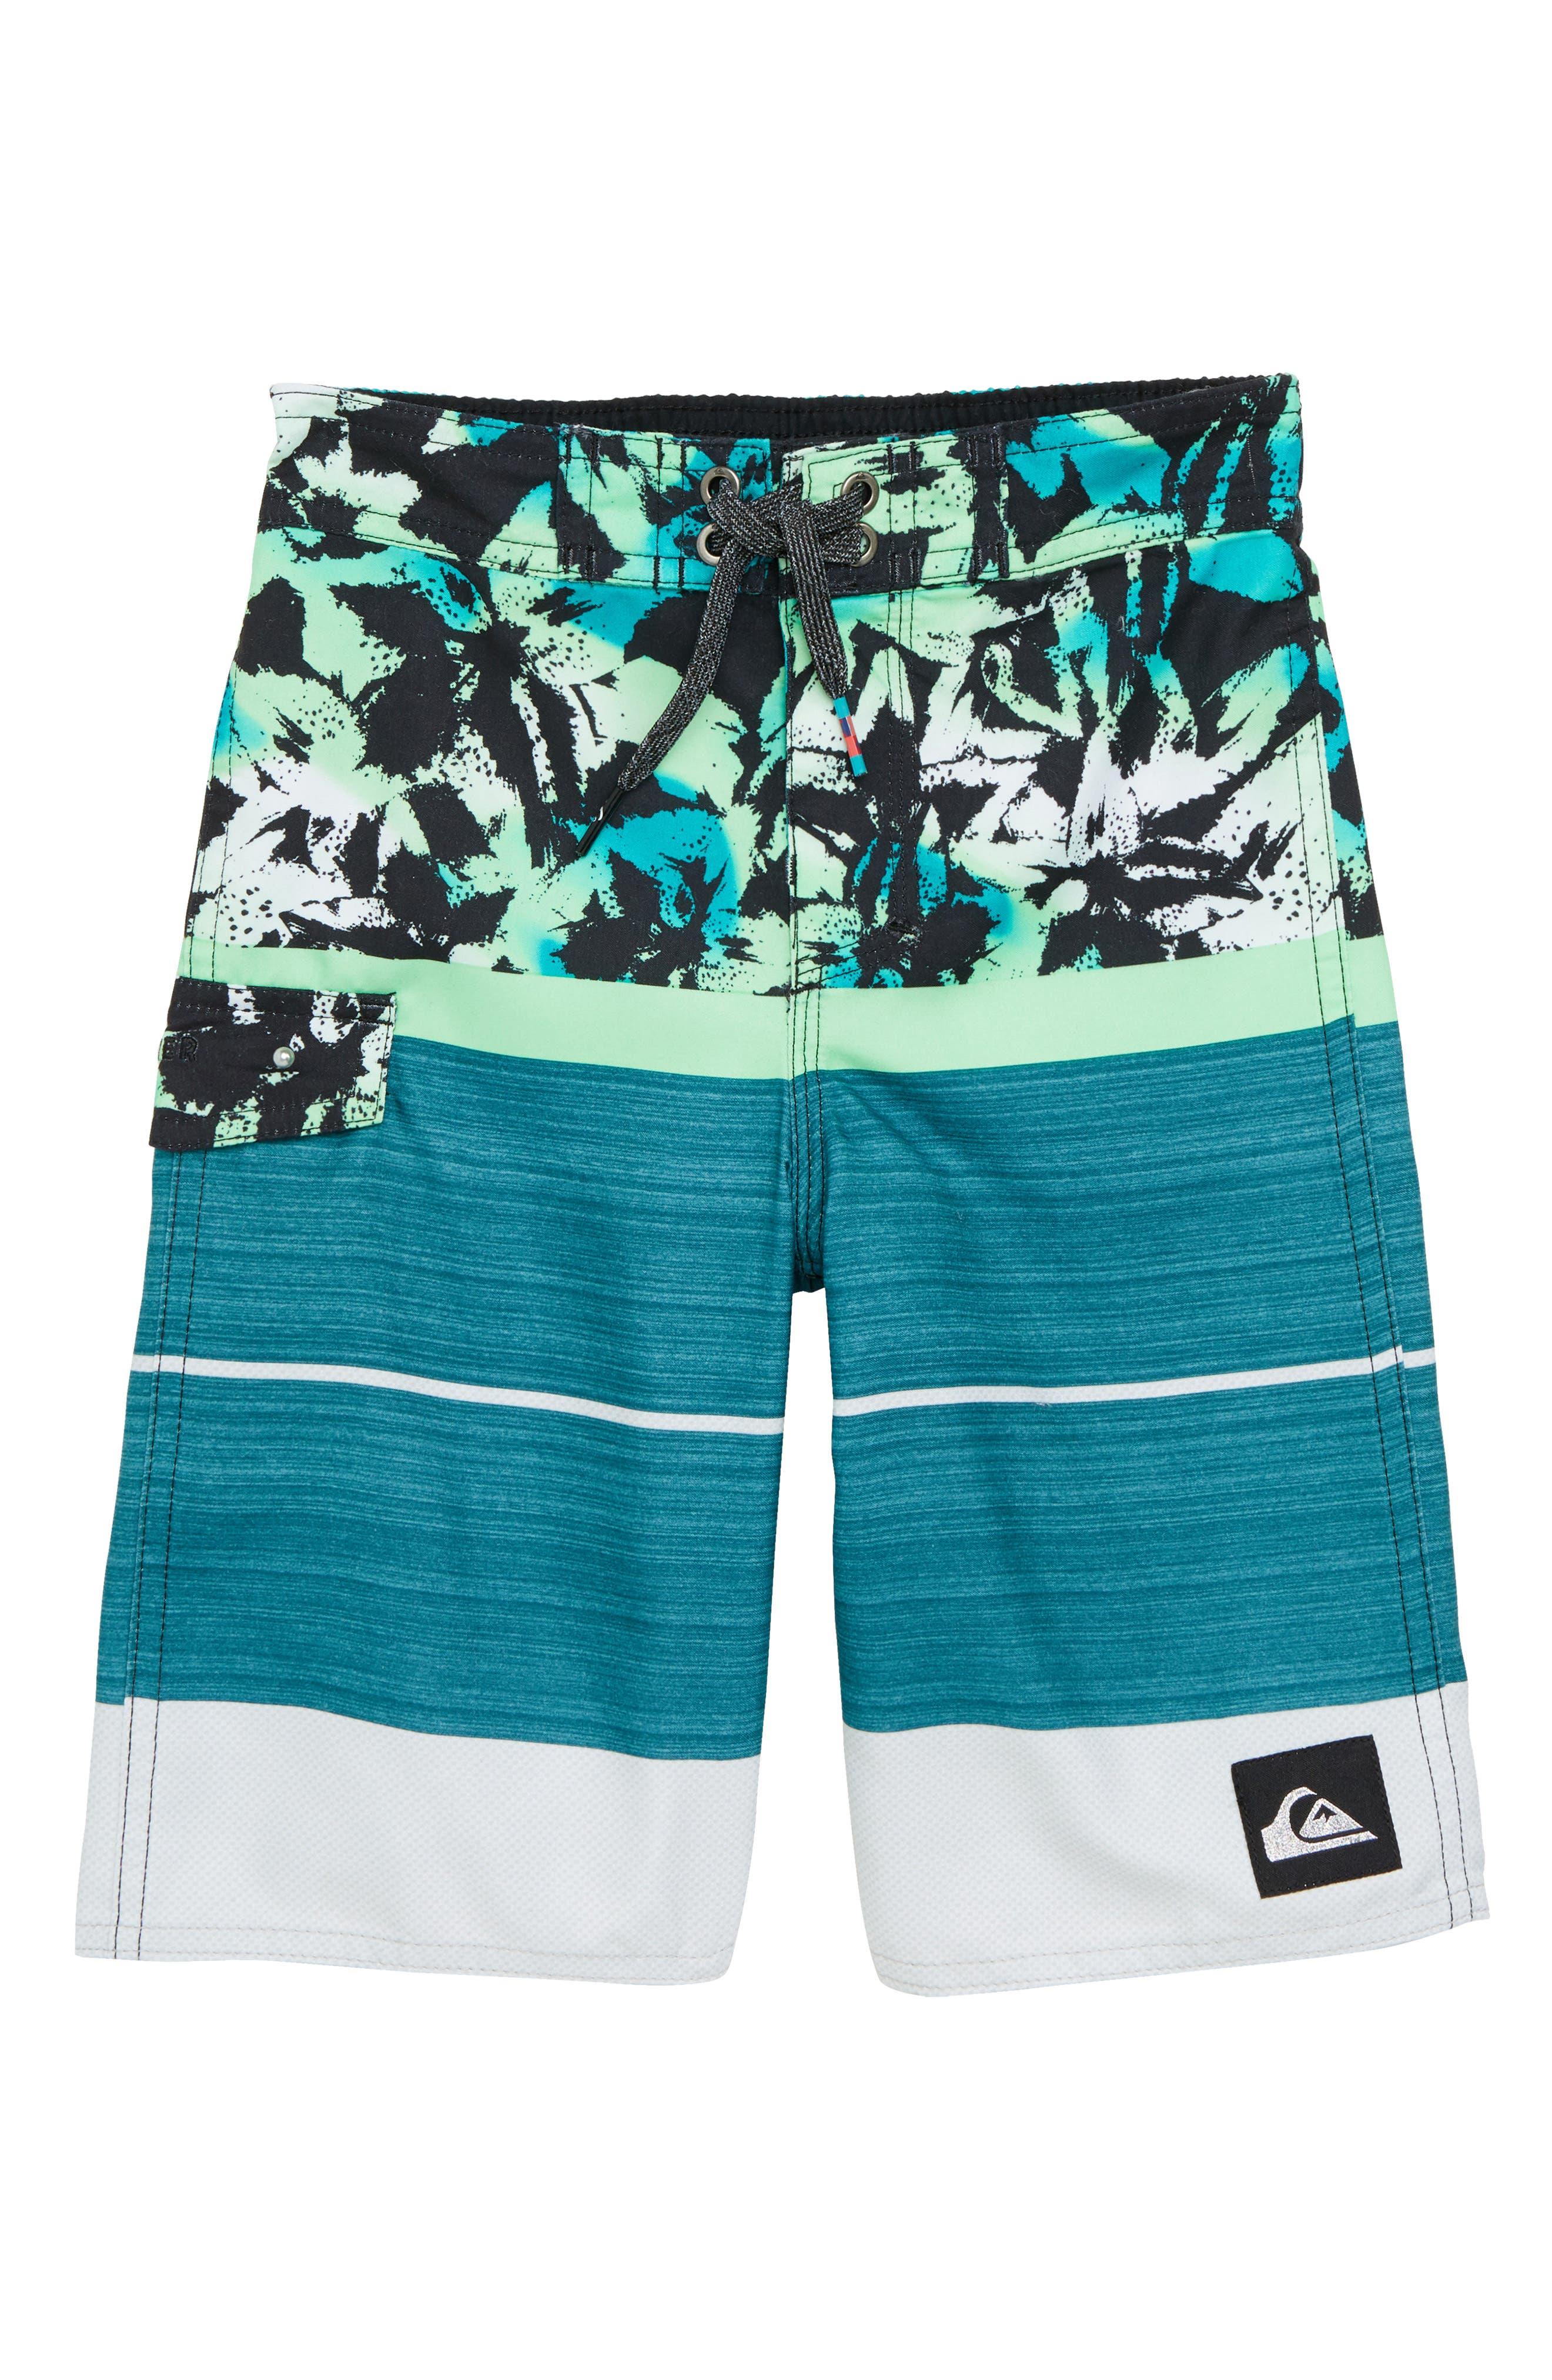 Slab Island Board Shorts,                         Main,                         color, Atlantic Deep